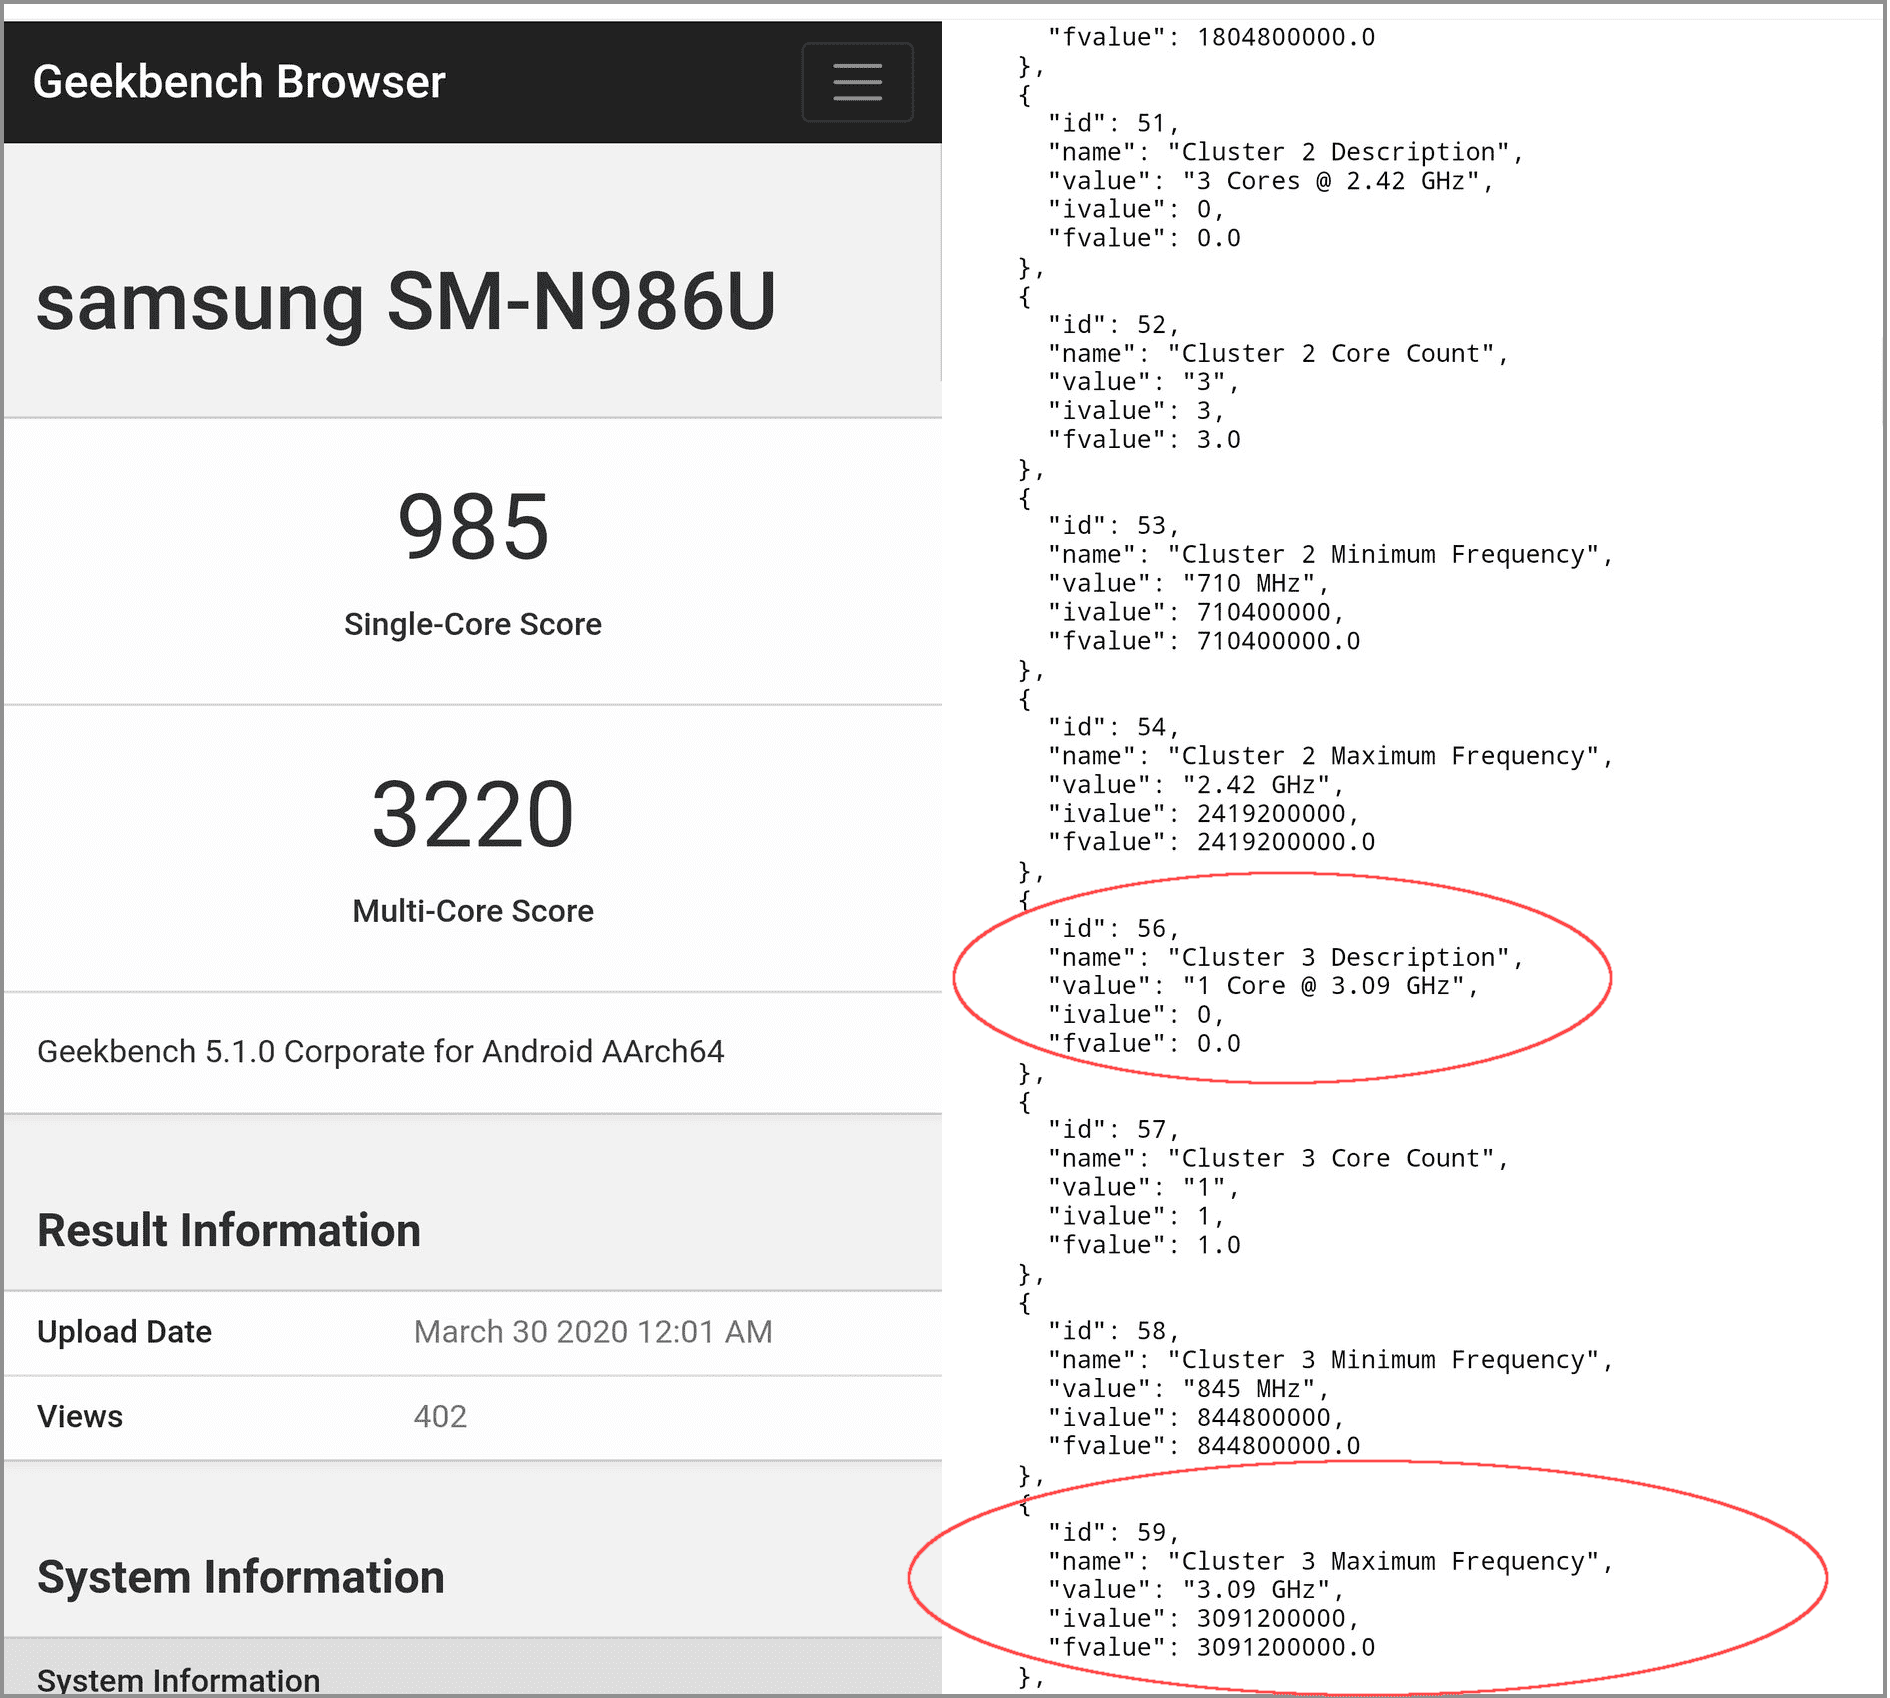 Samsung Galaxy Note 20 Qualcomm Snapdragon 865+